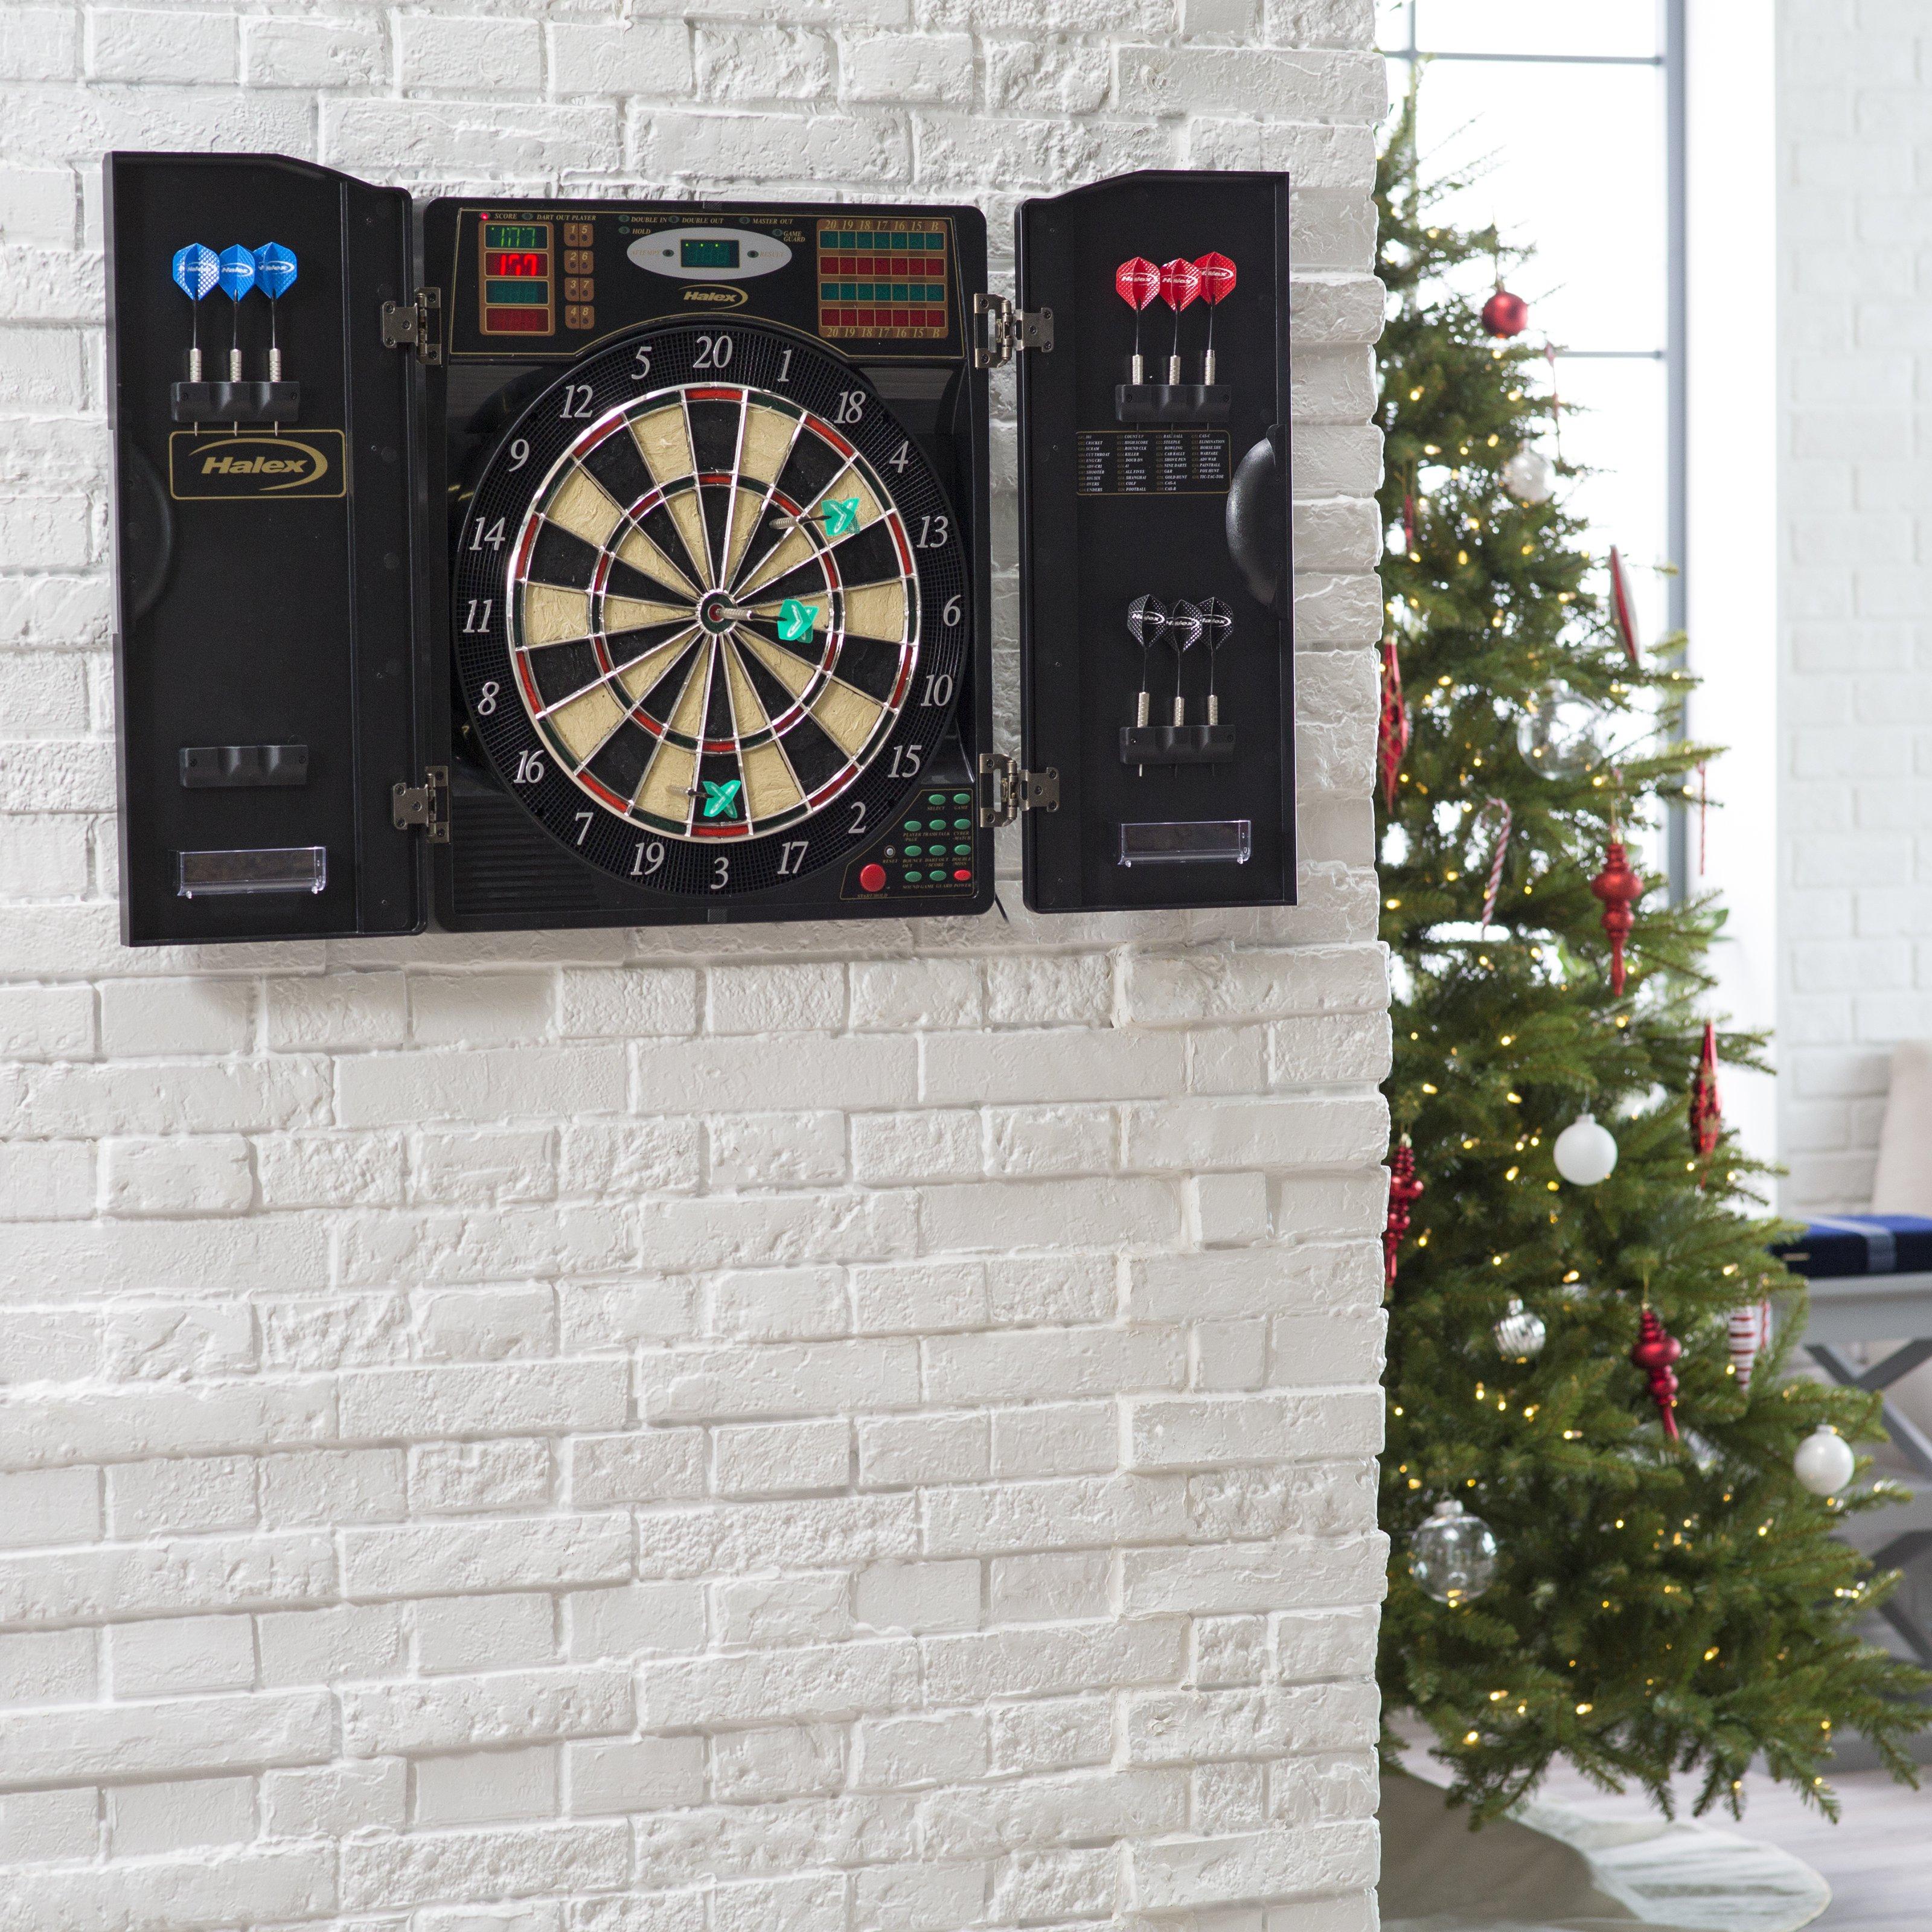 Halex Madison Bristletech Electronic Dart Board Complete